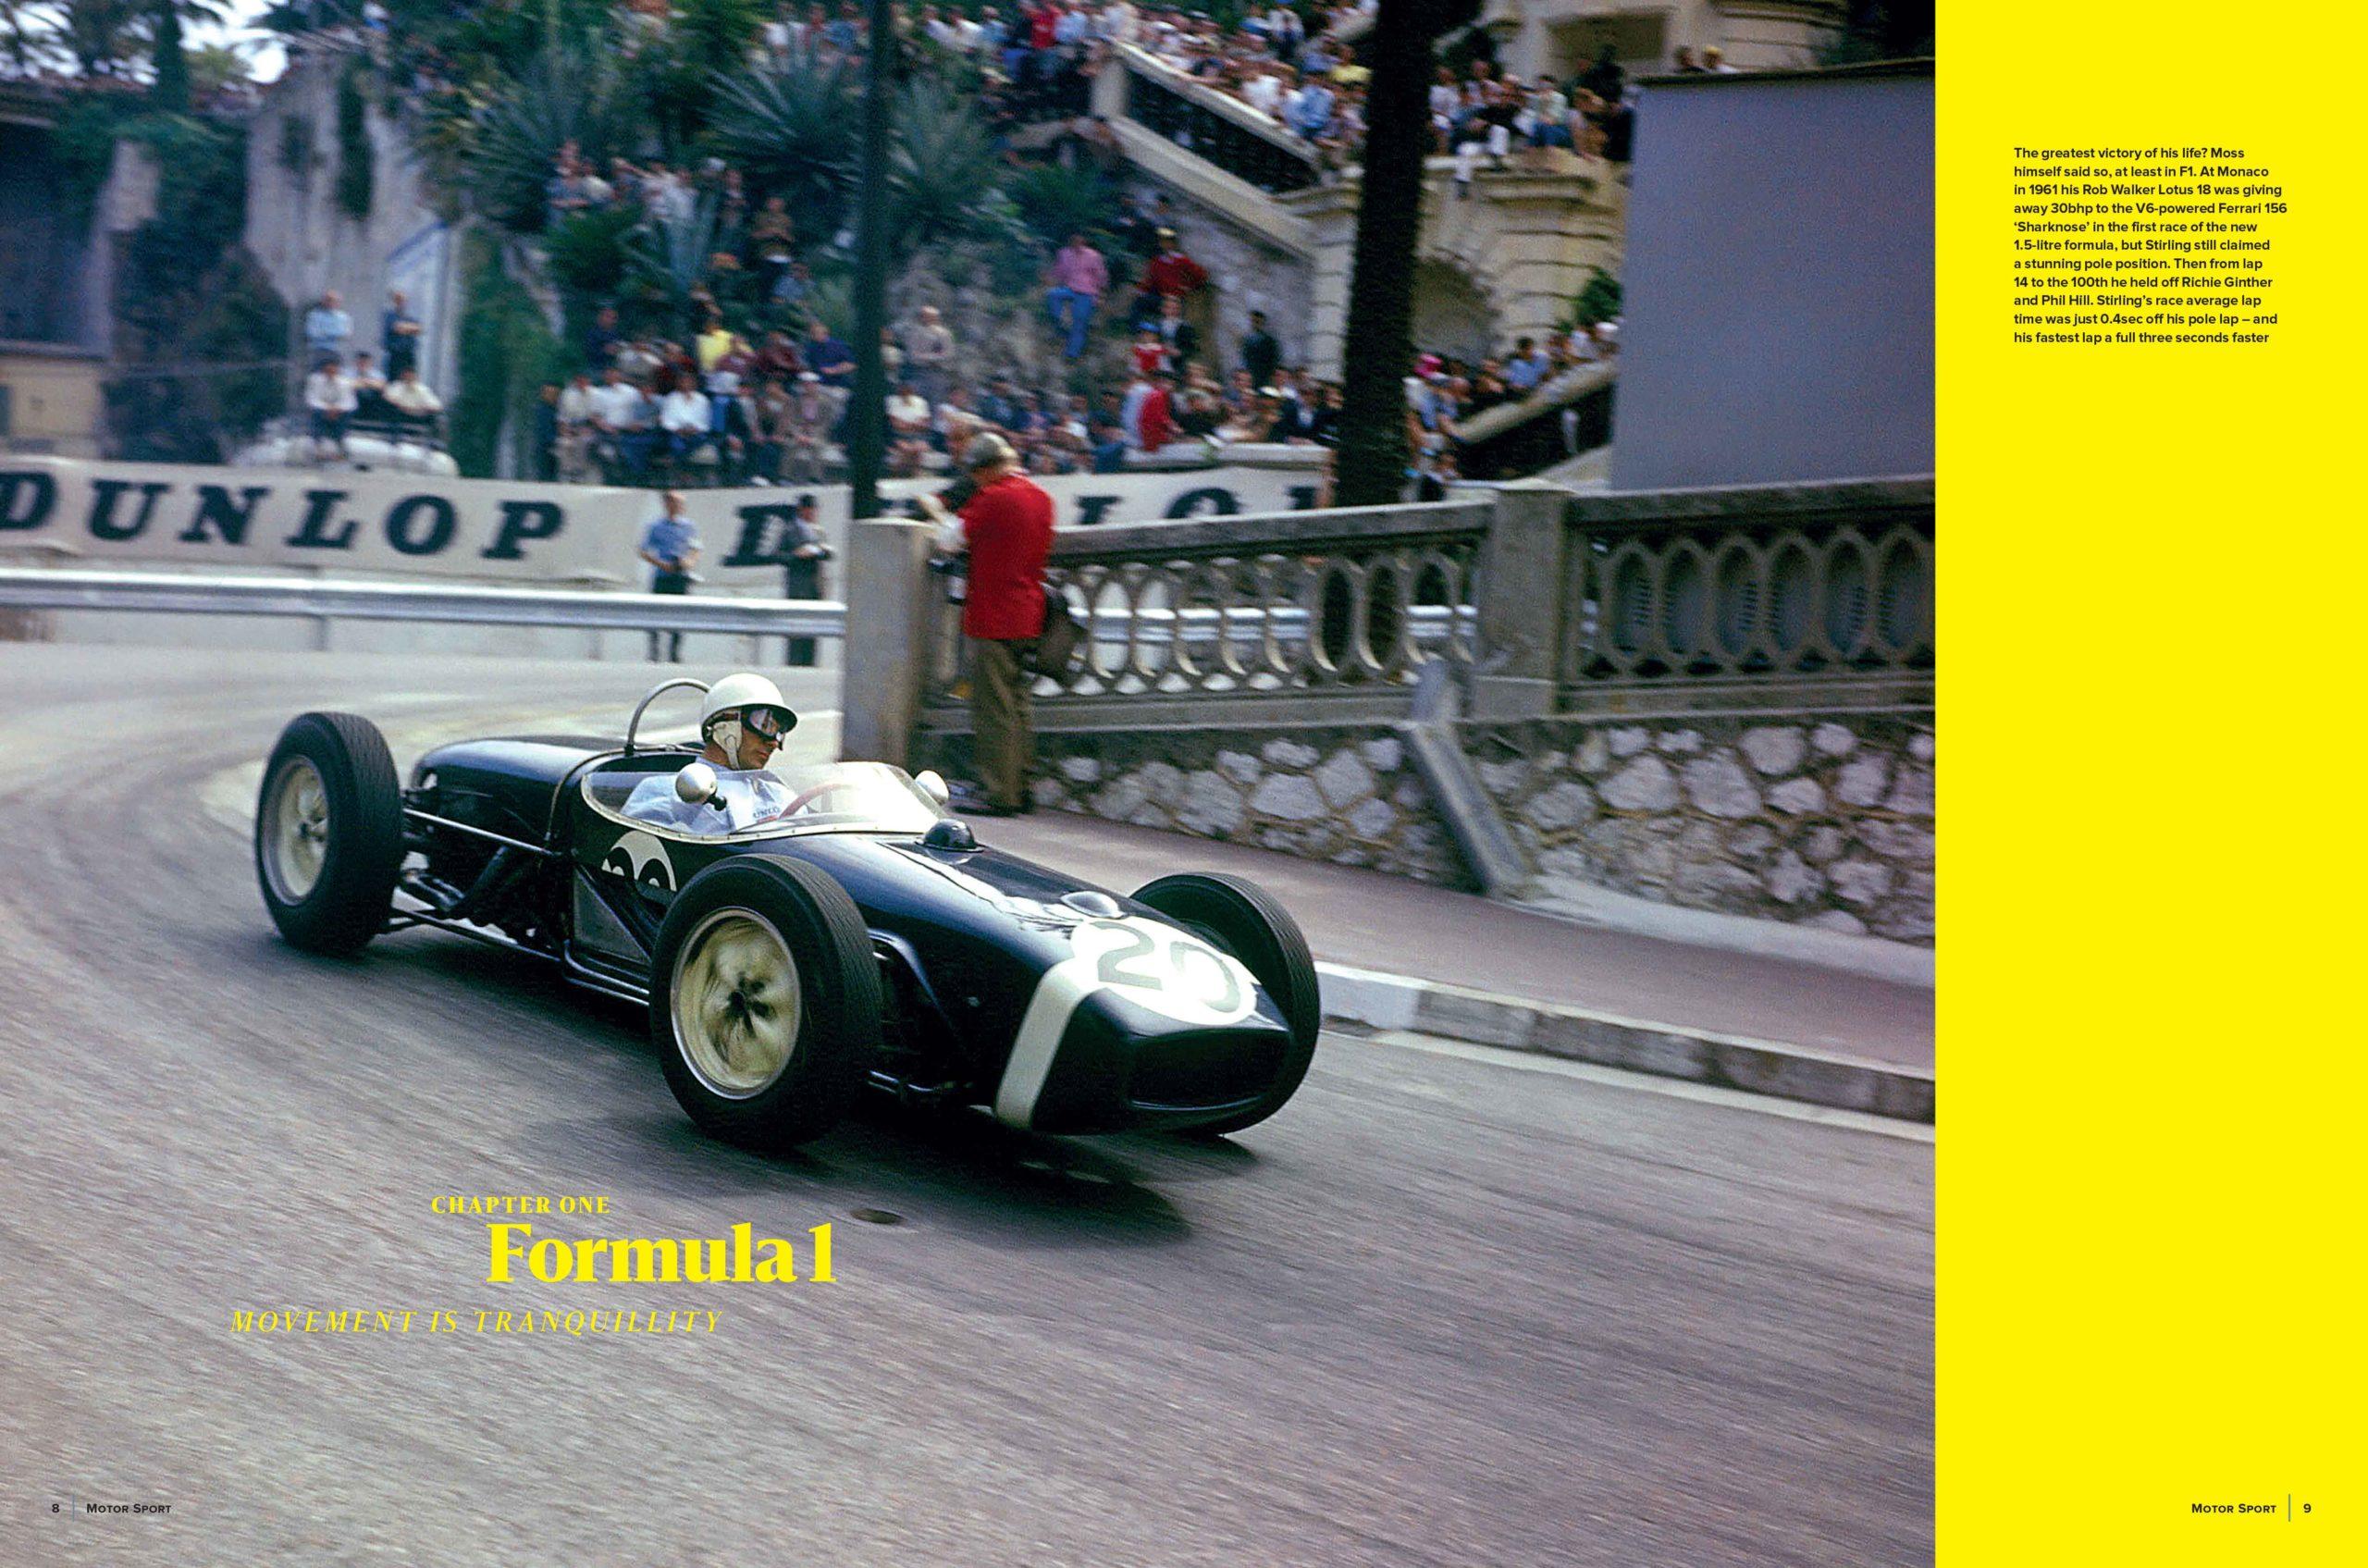 Moss F1 spread